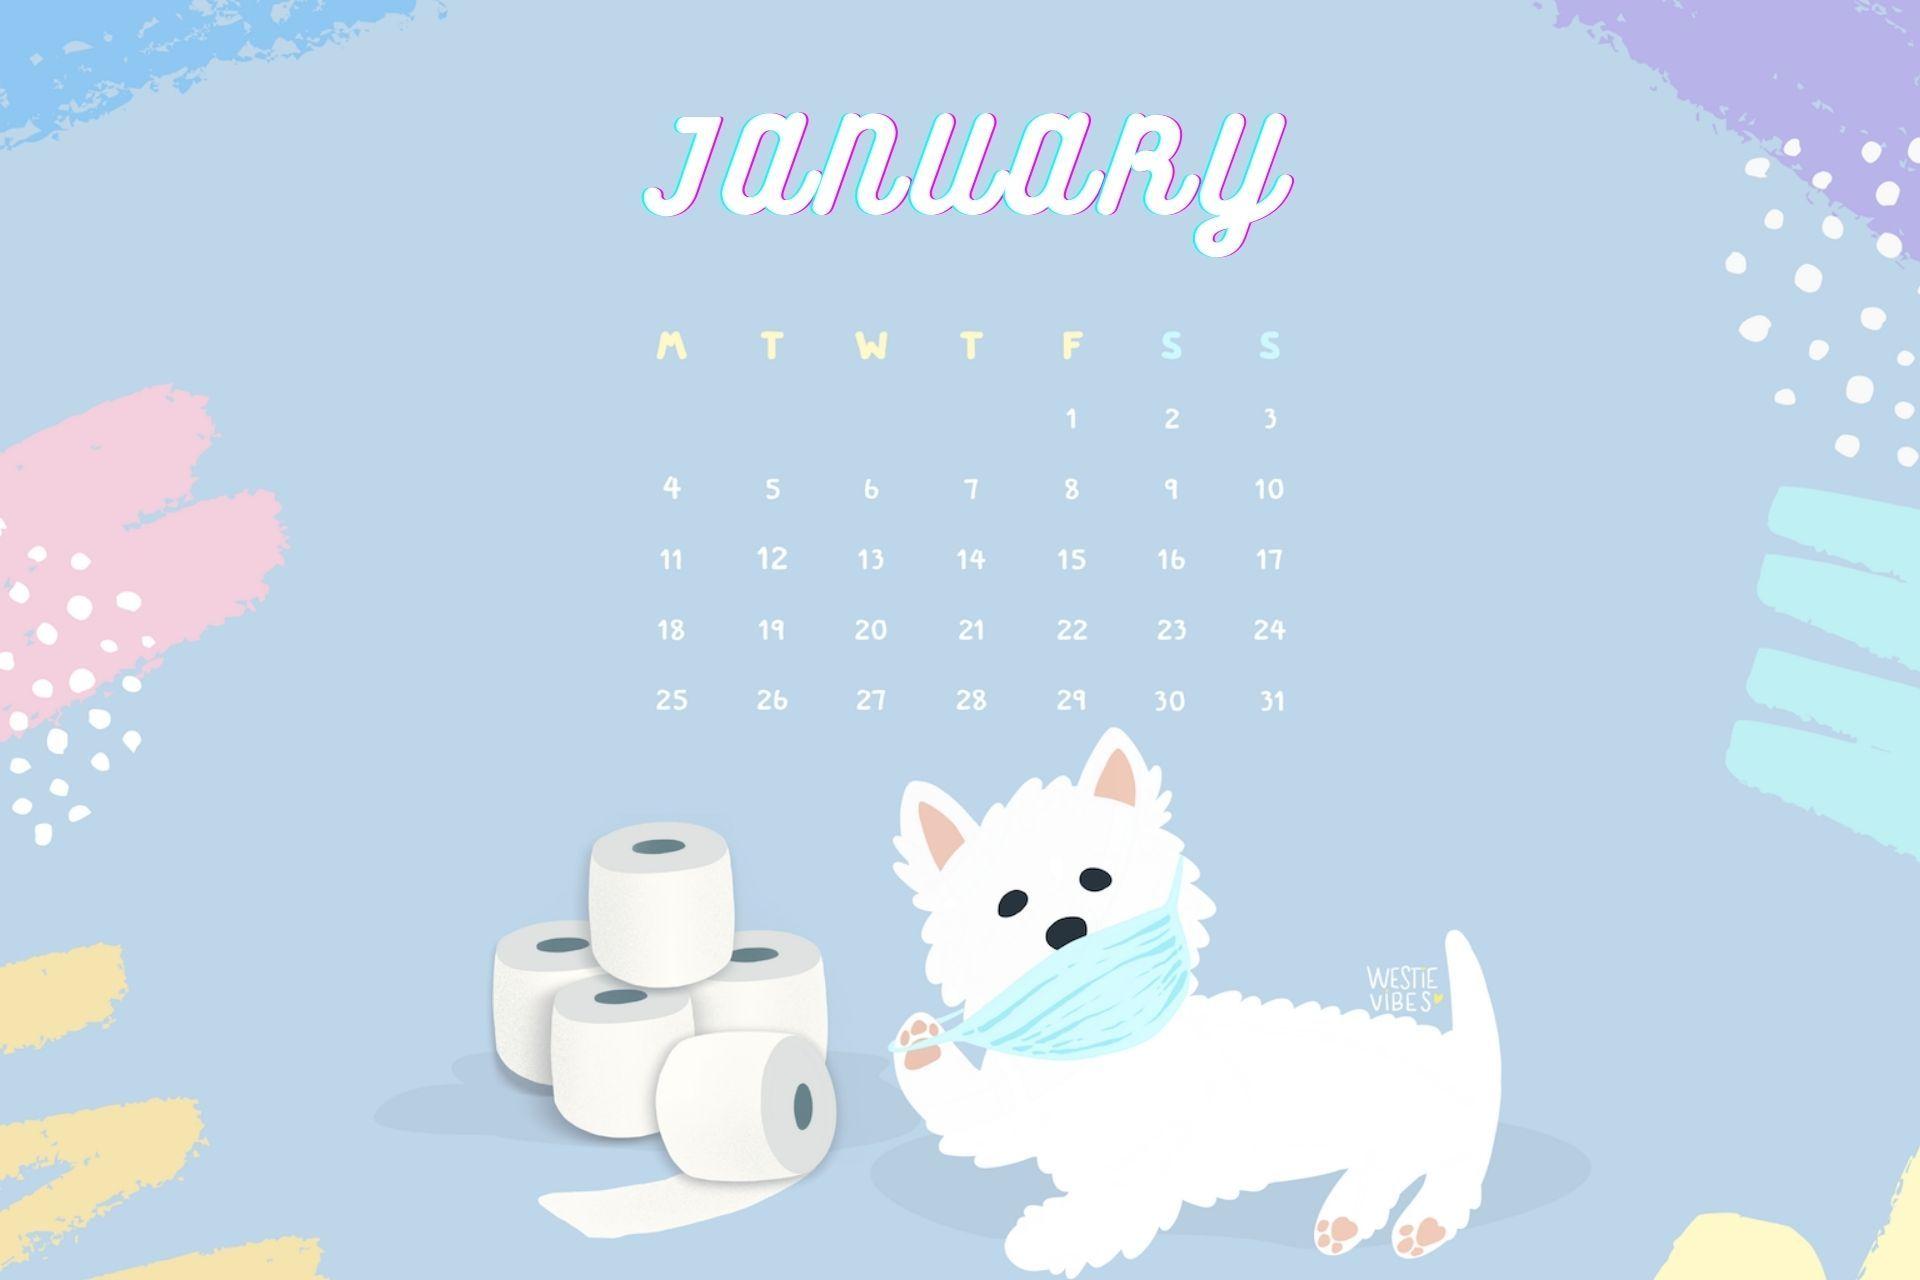 January 2021 Hd Calendar Wallpaper Featuring Cute Puppy Calendar Wallpaper Free Printable Calendar Templates 2021 Calendar